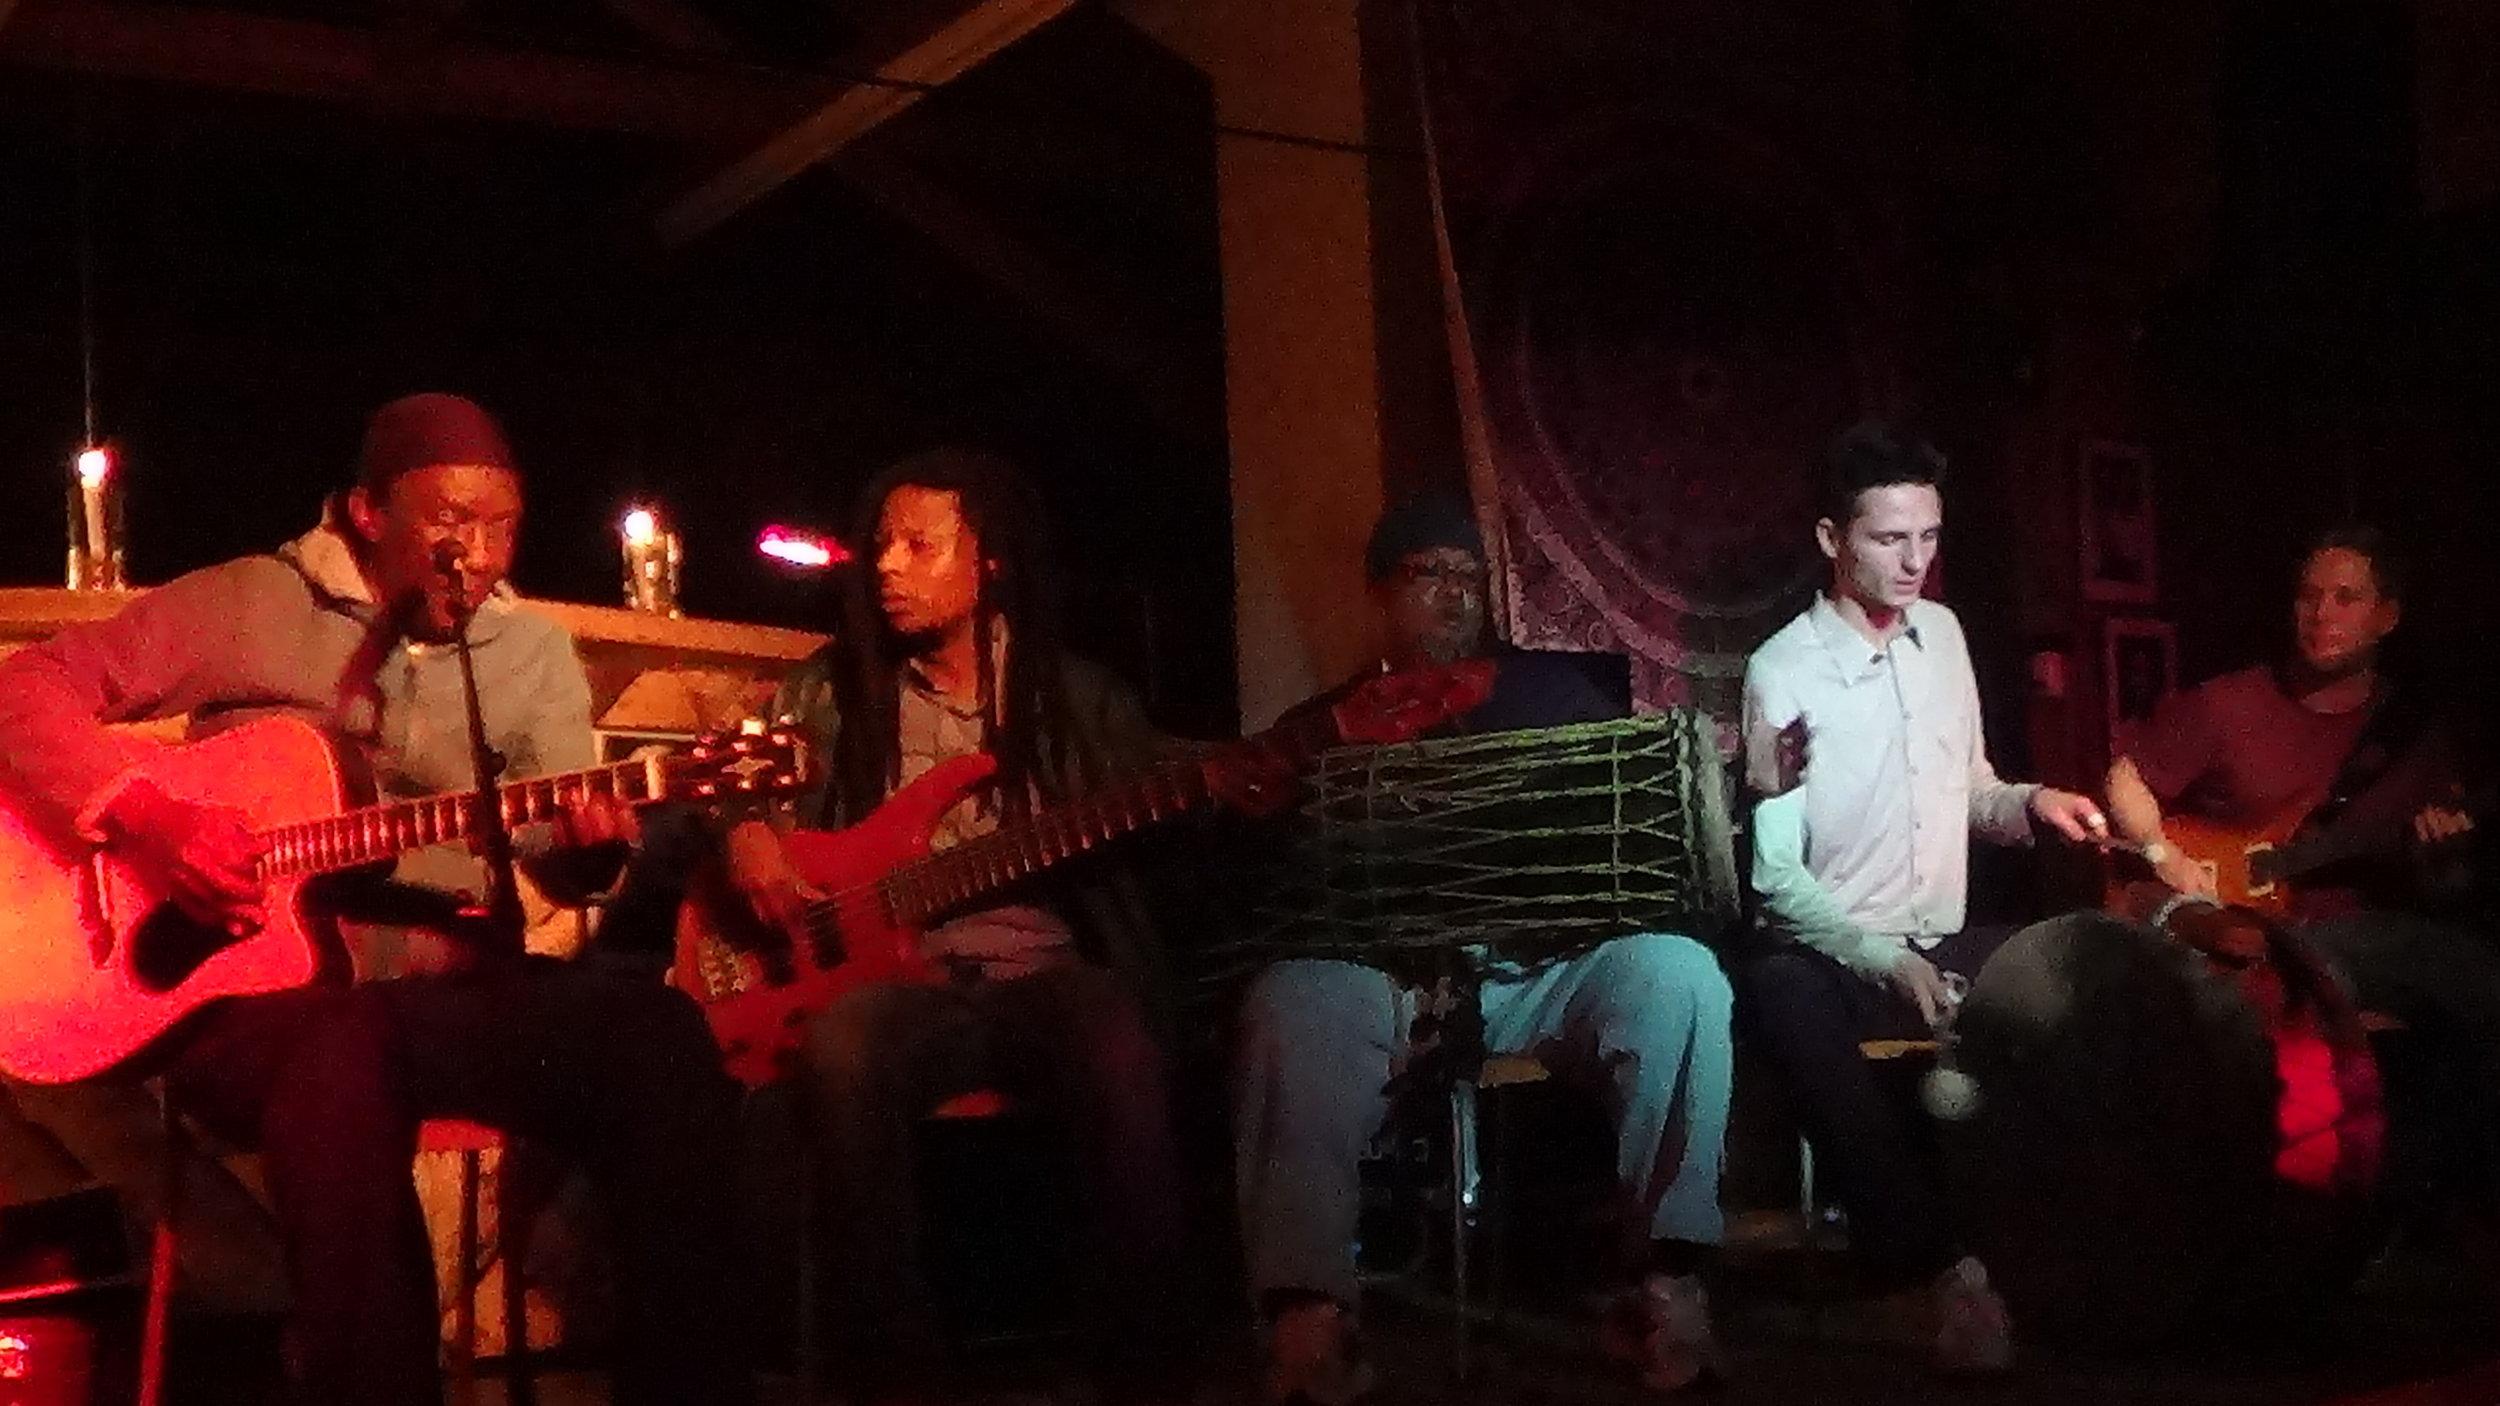 Madala, Frank, Ricky, Fabio & Carlo 2 @ Sipho bar FJ.JPG